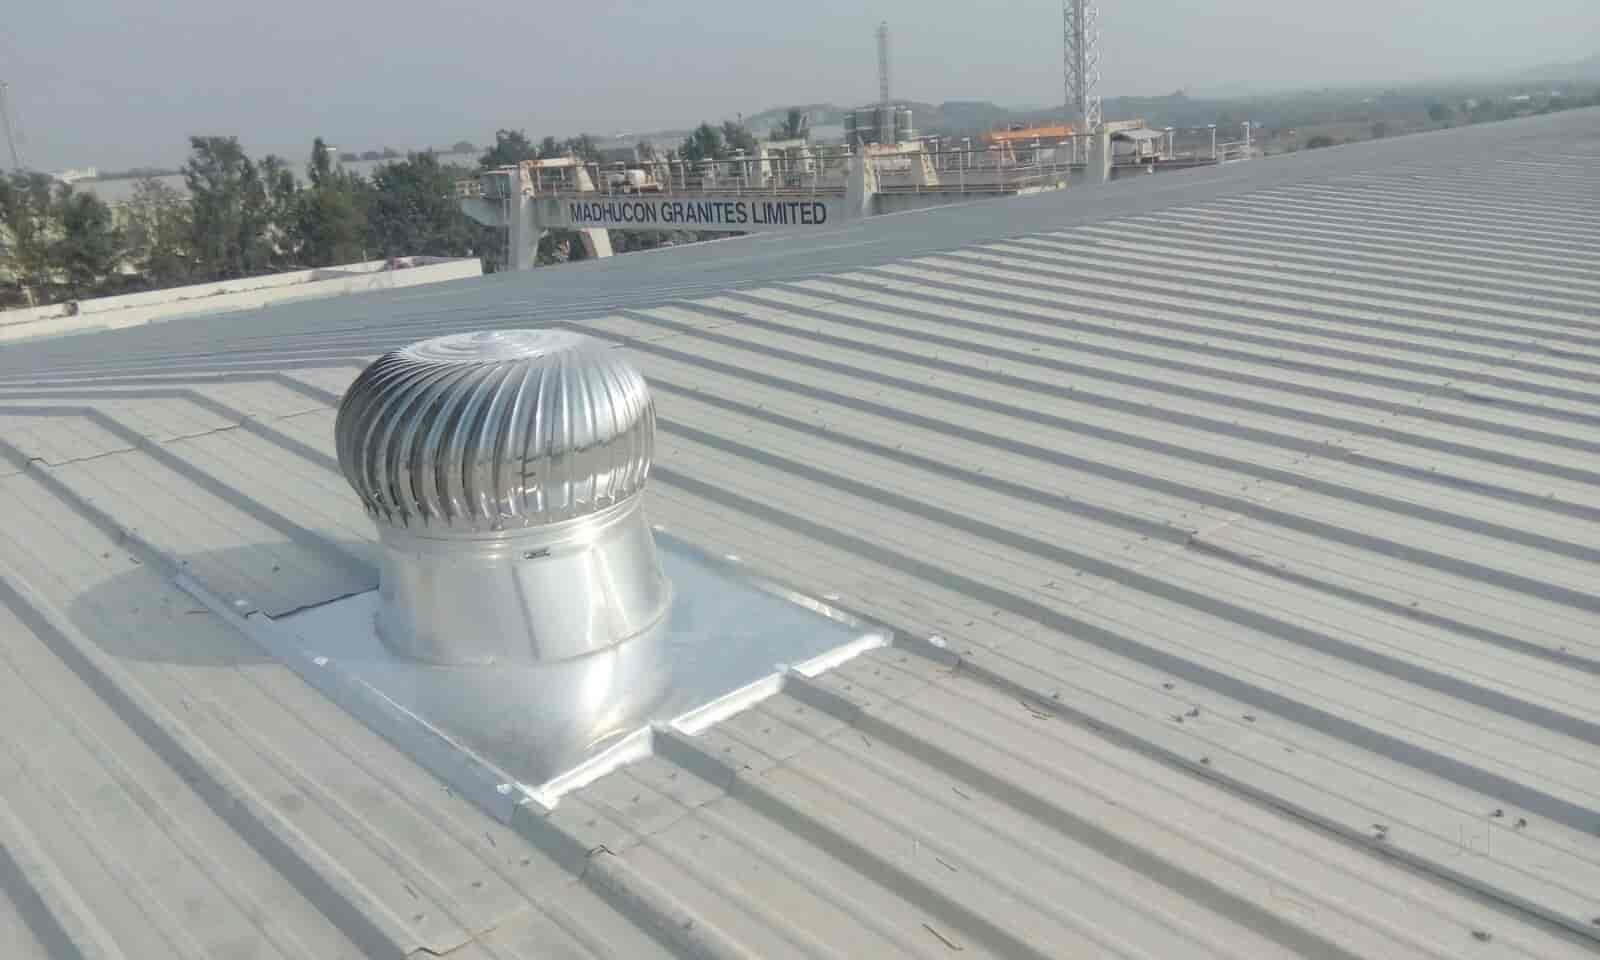 air roof ventilators photos, vidyaranyapura, bangalore- pictures